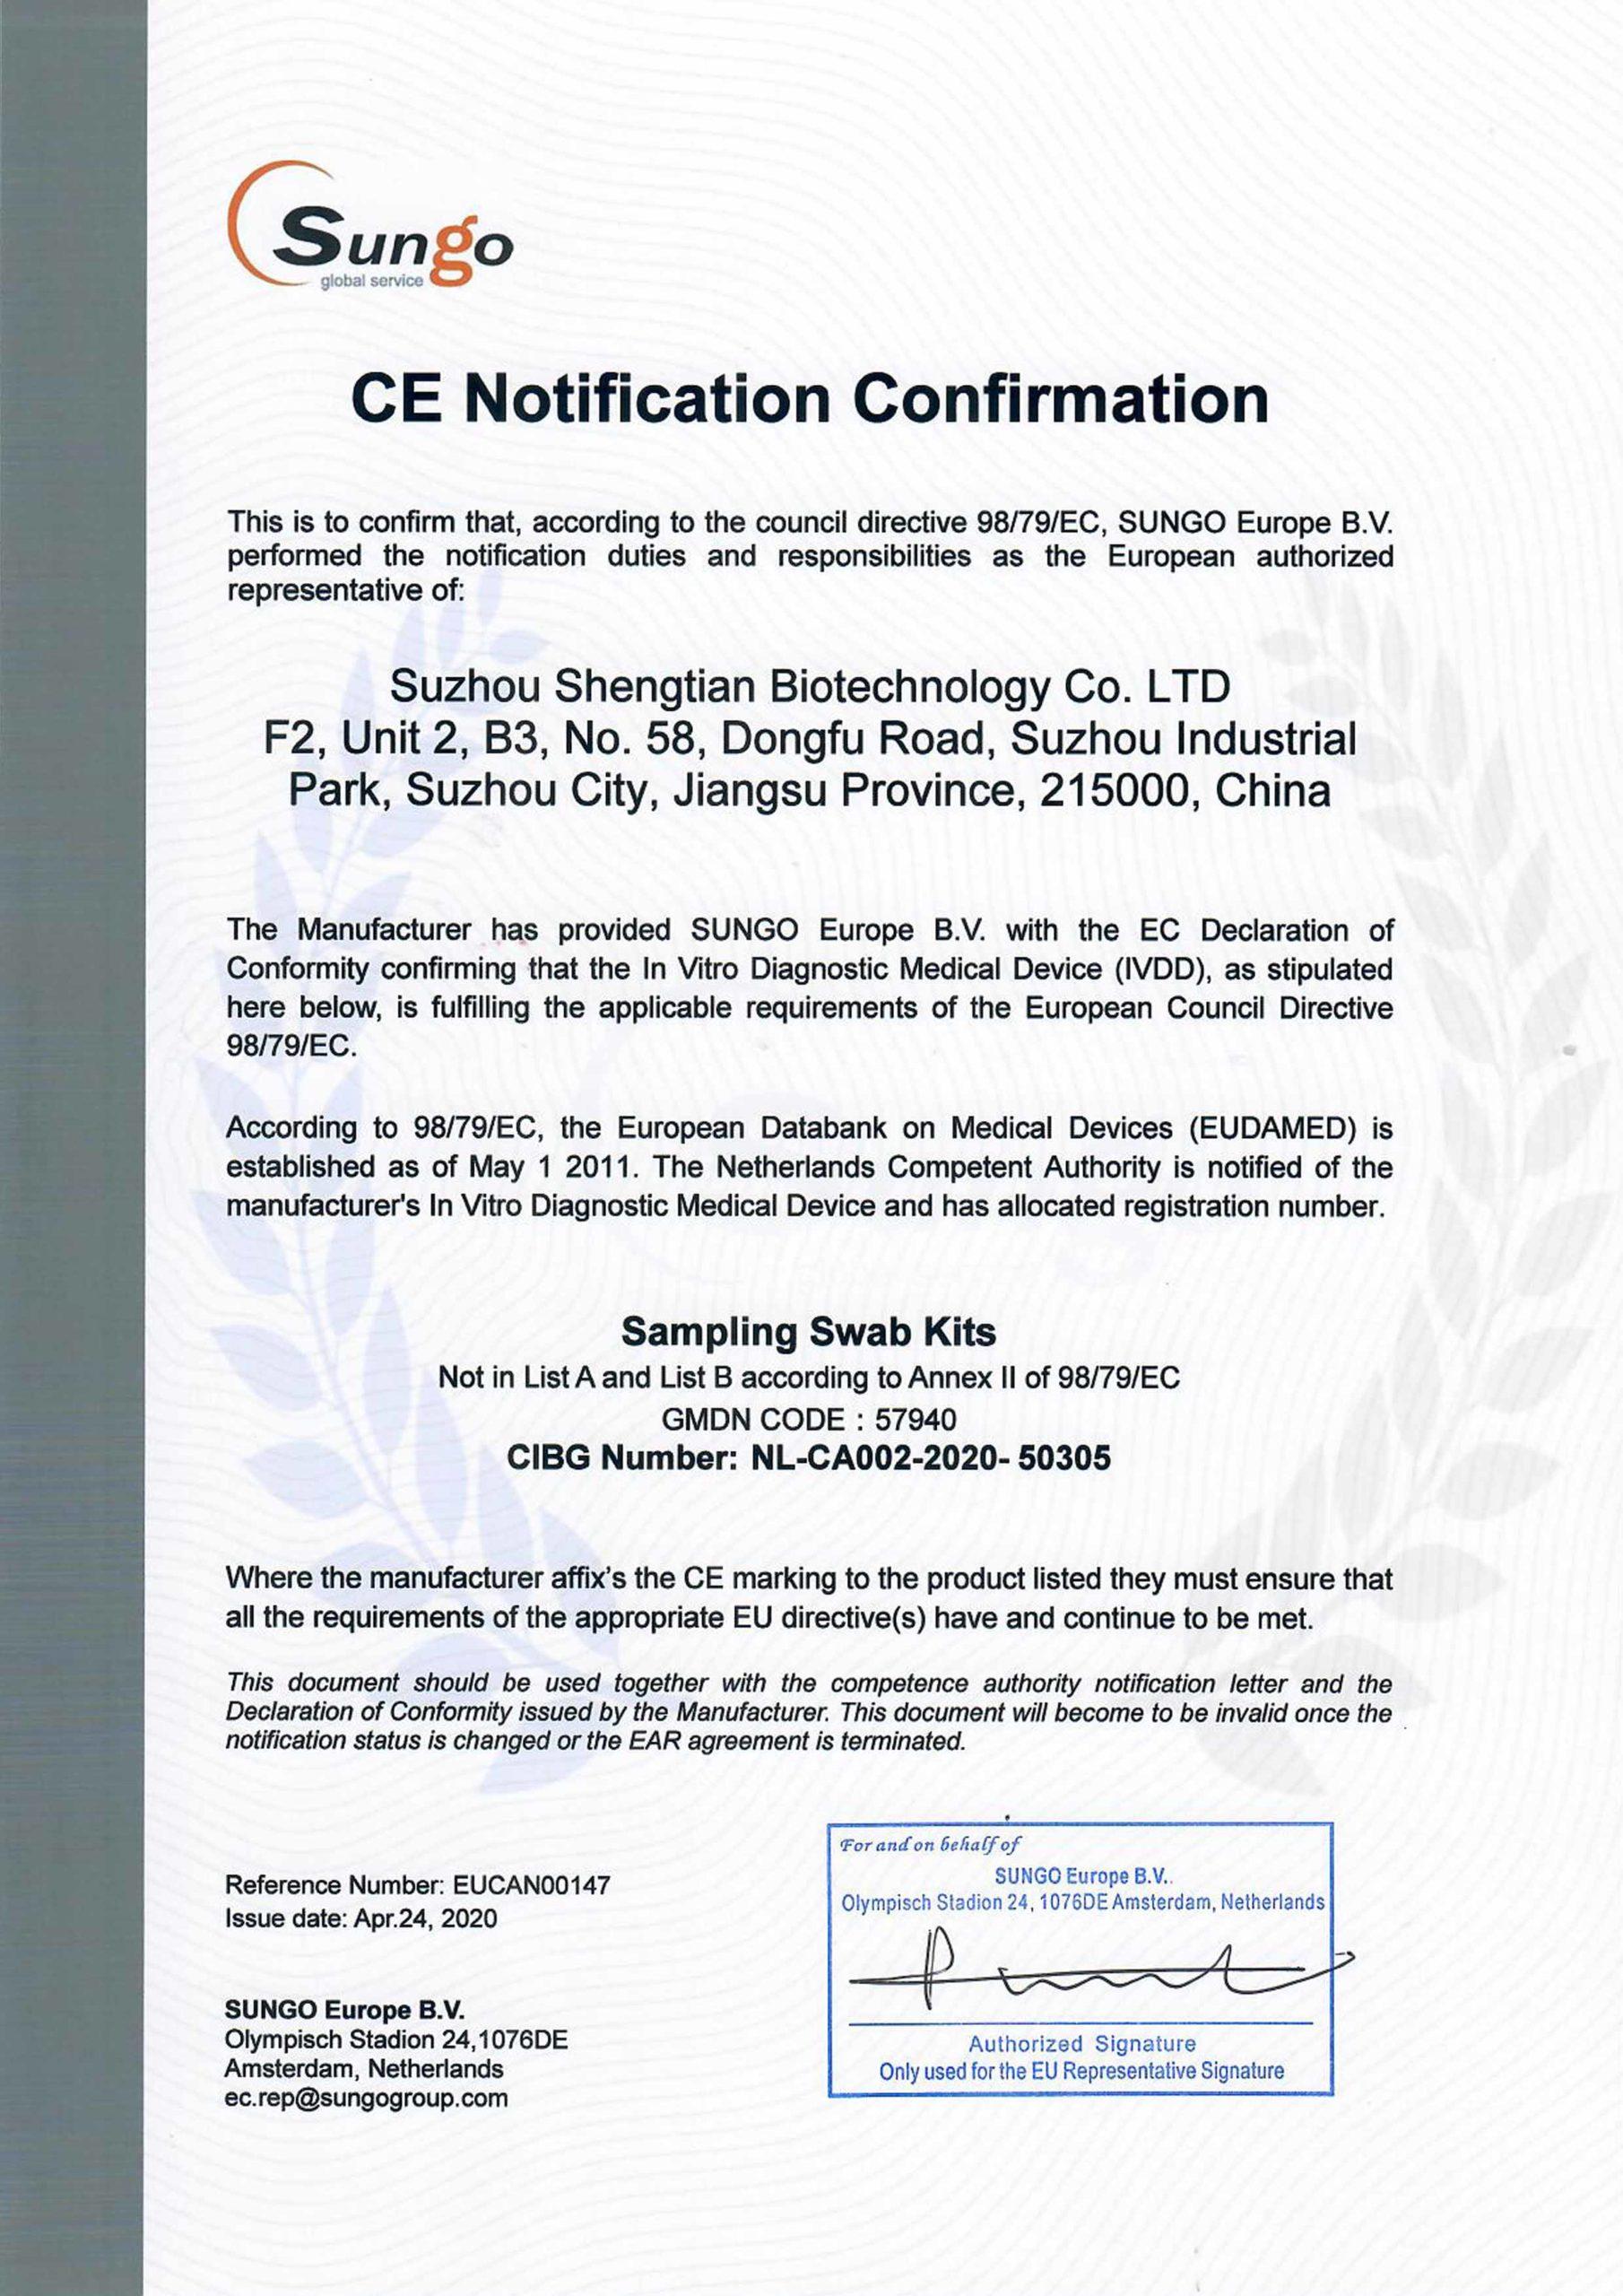 CE Notification Confirmation Certificate